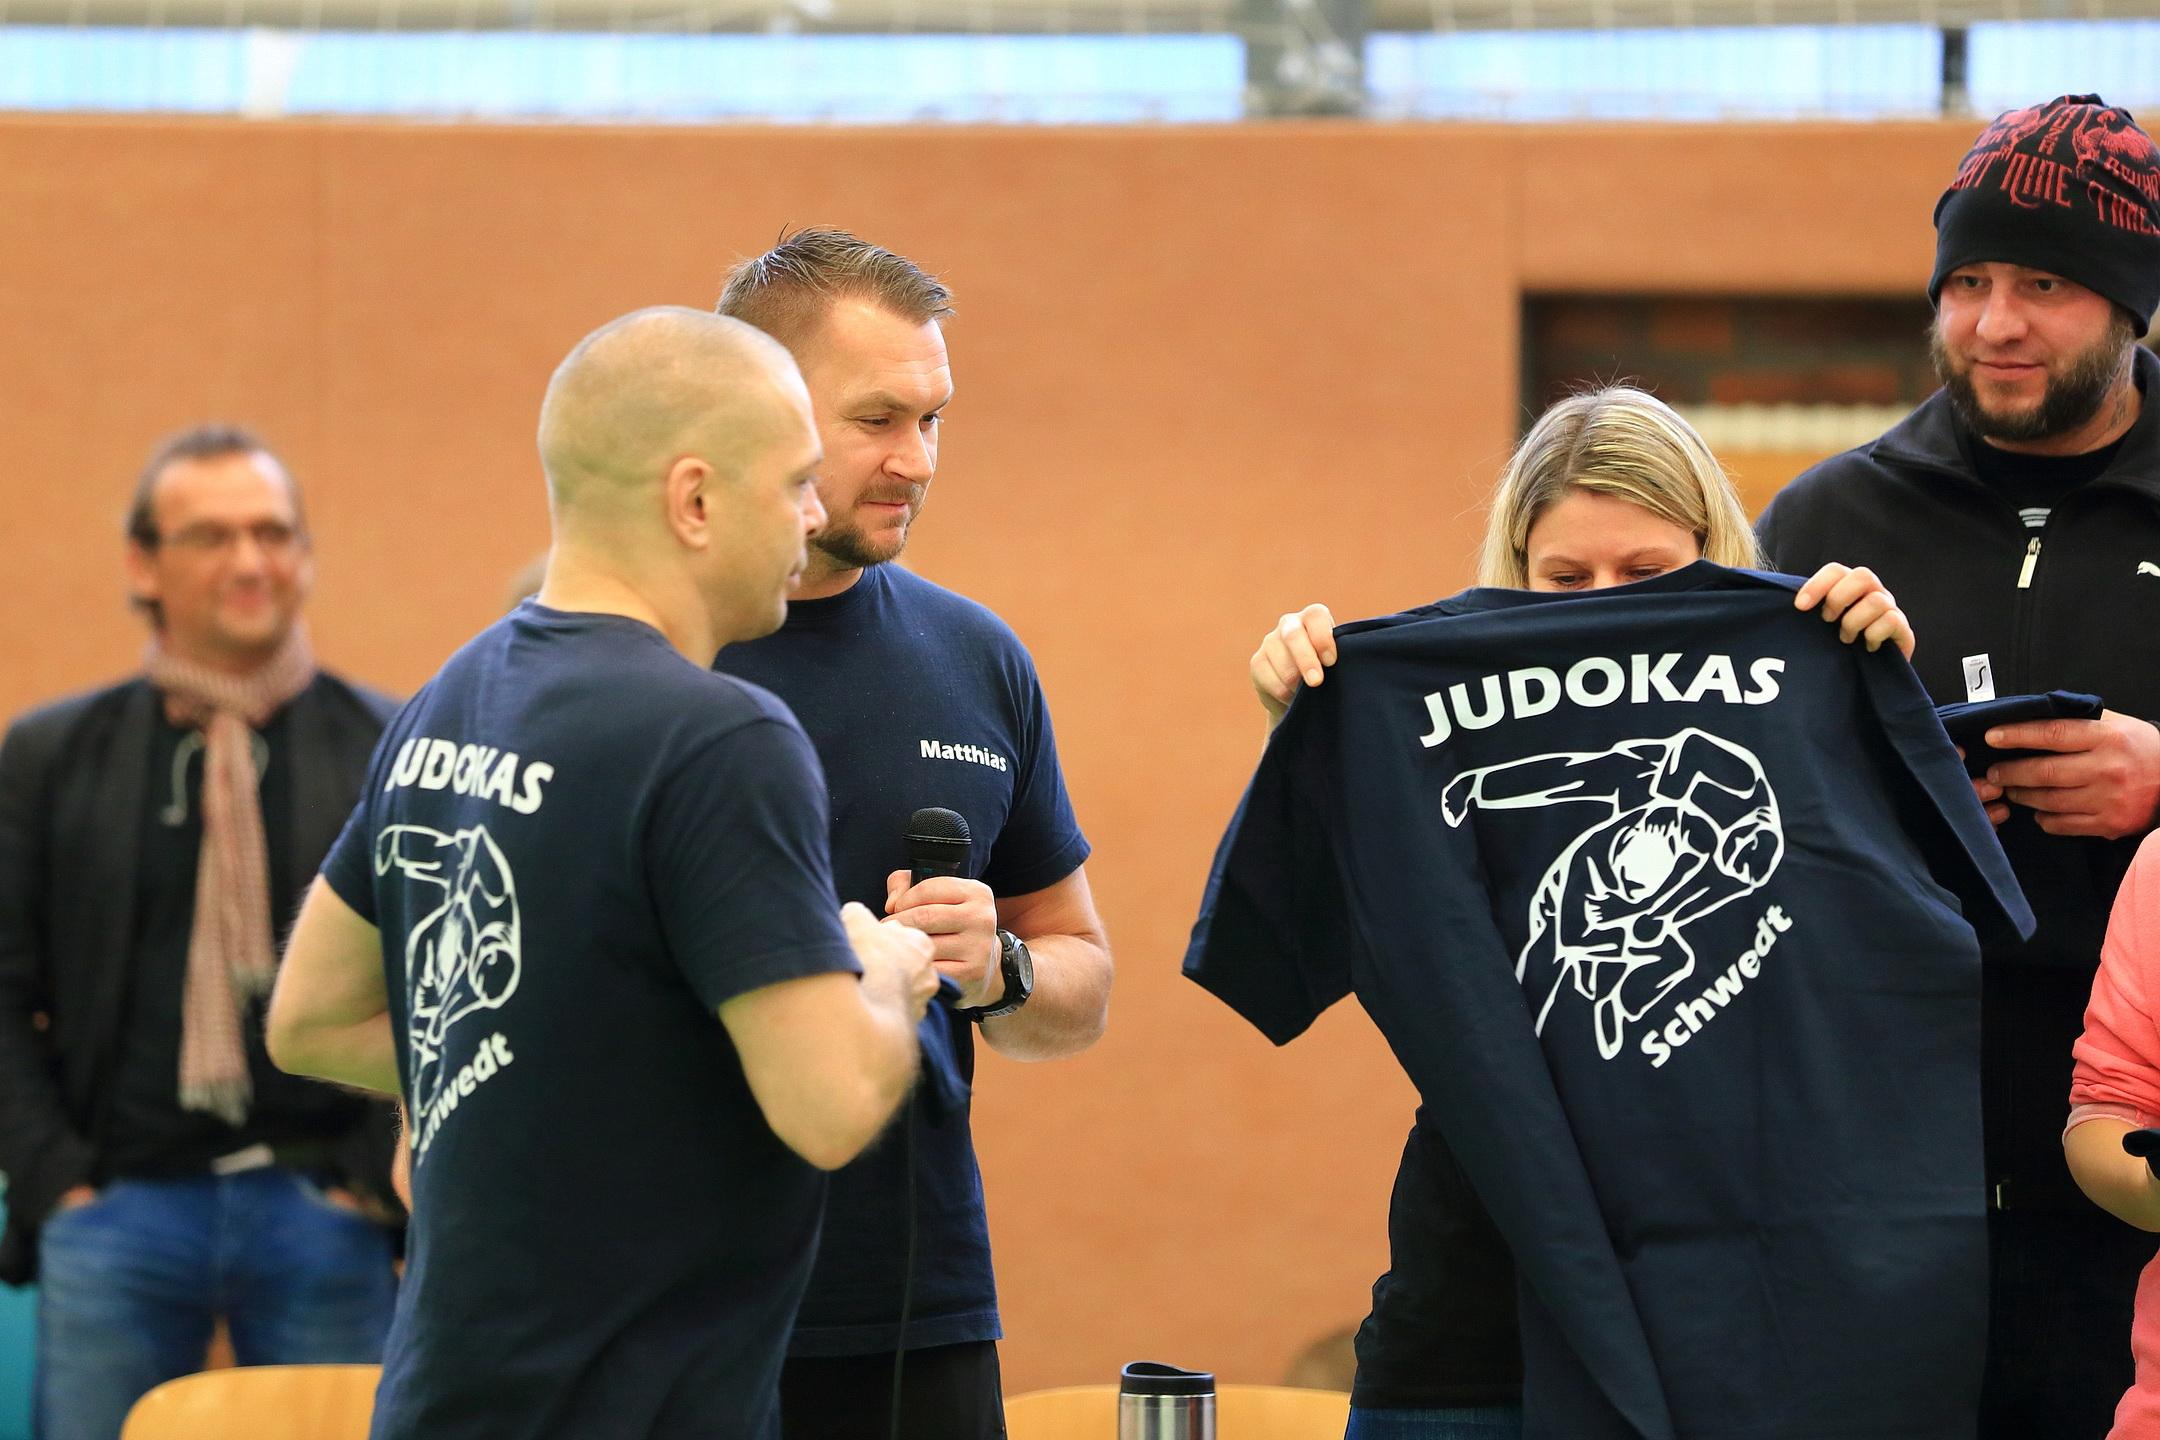 2016-Nikolausturnier Judokas Schwedt (30)